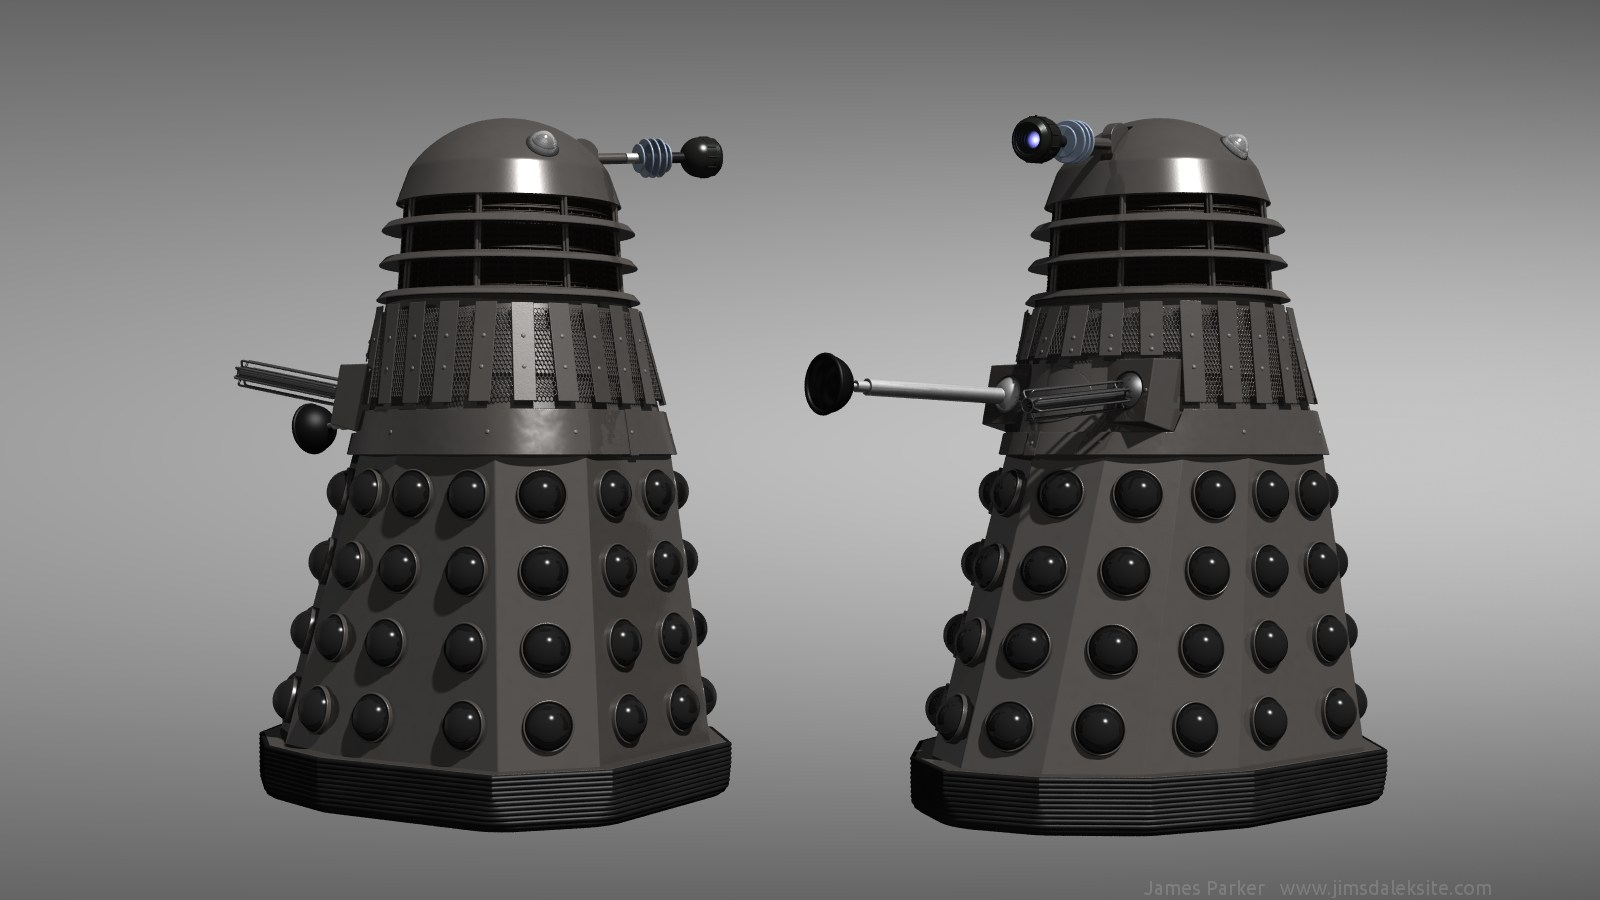 Day of the Daleks - Grey Dalek reimagined by Jim197 on DeviantArt